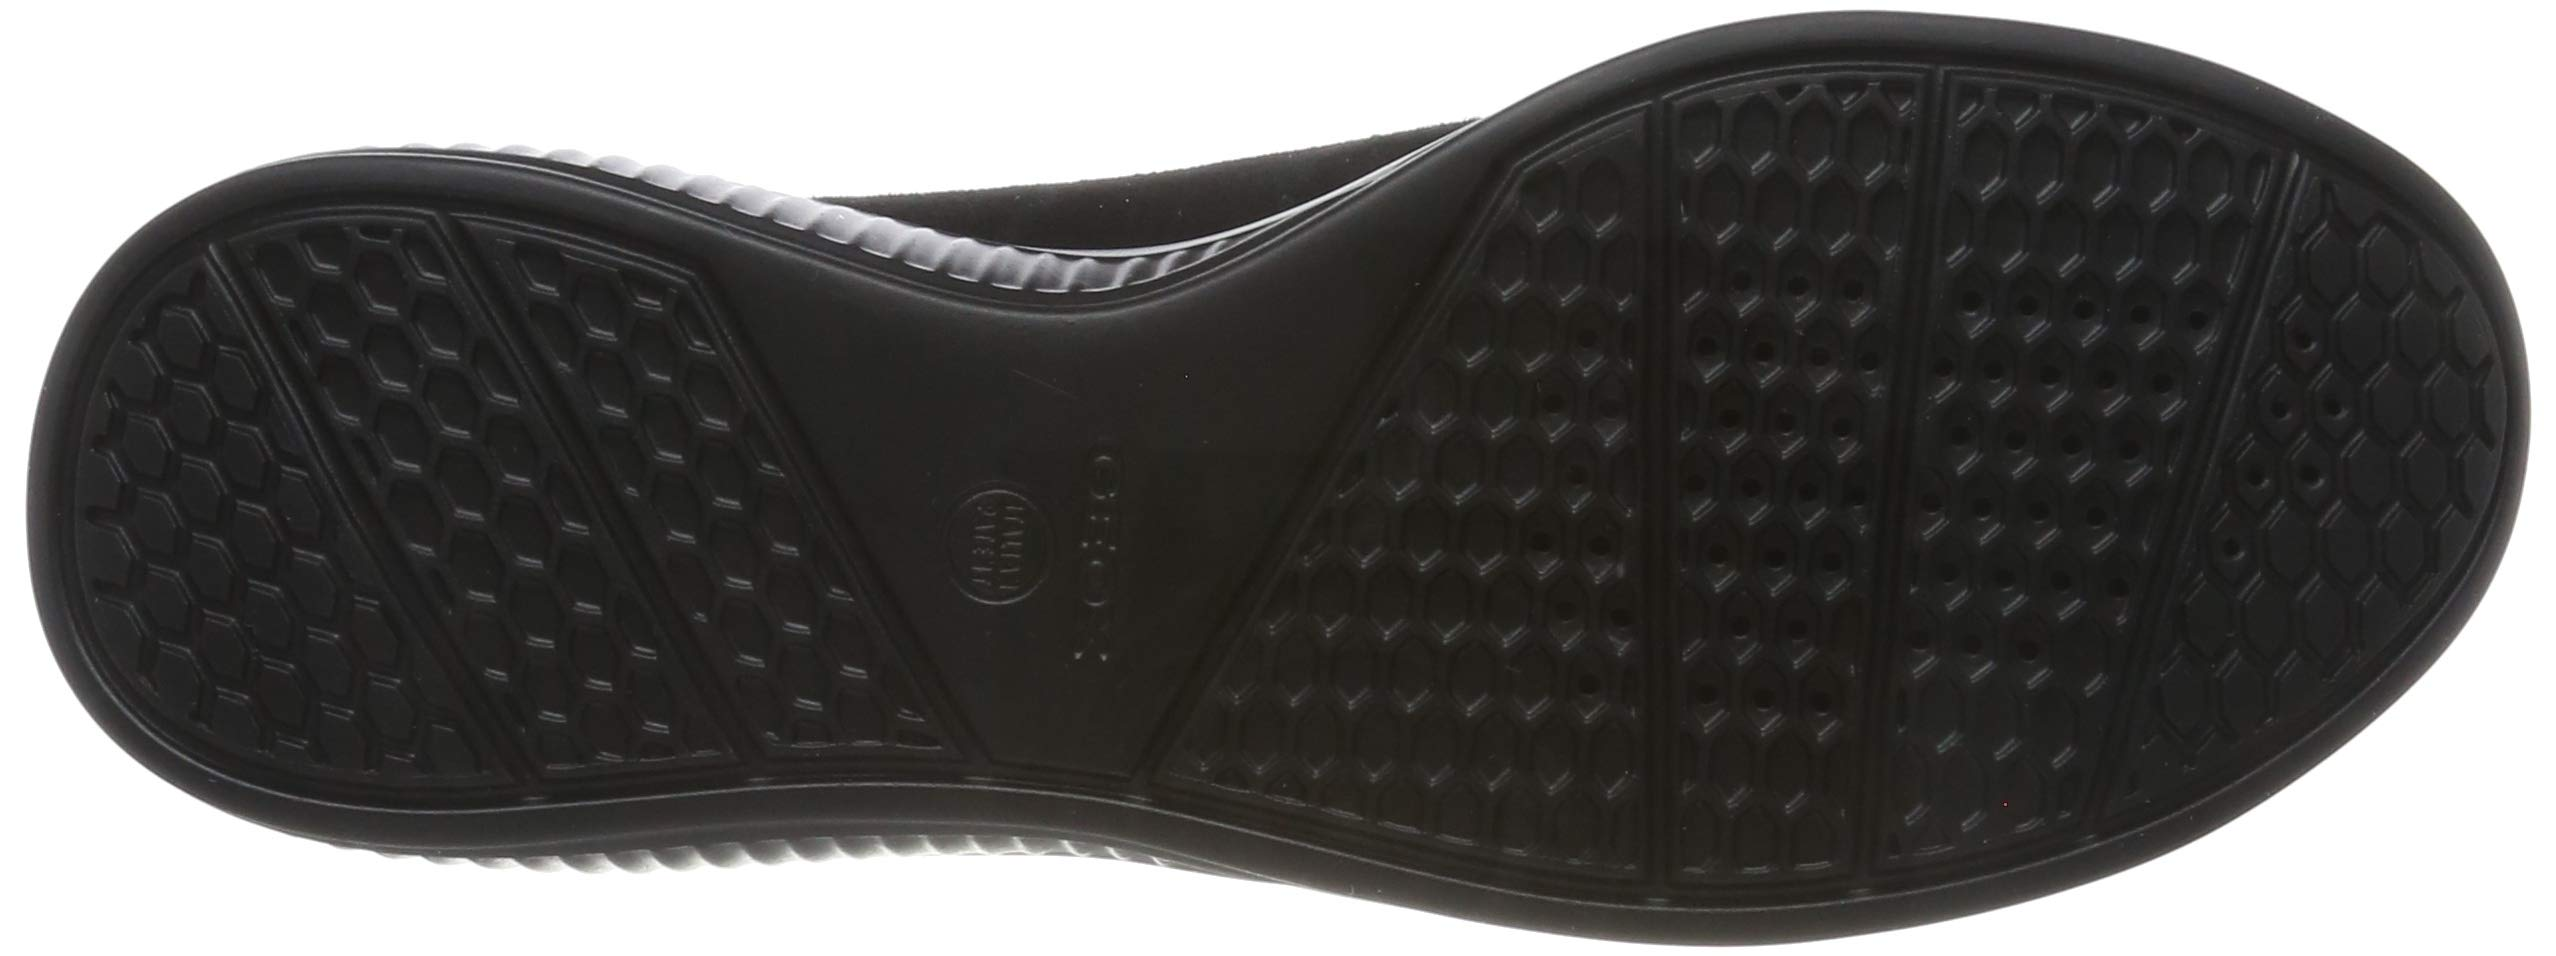 Geox Damen D Theragon A Slip On Sneaker 3